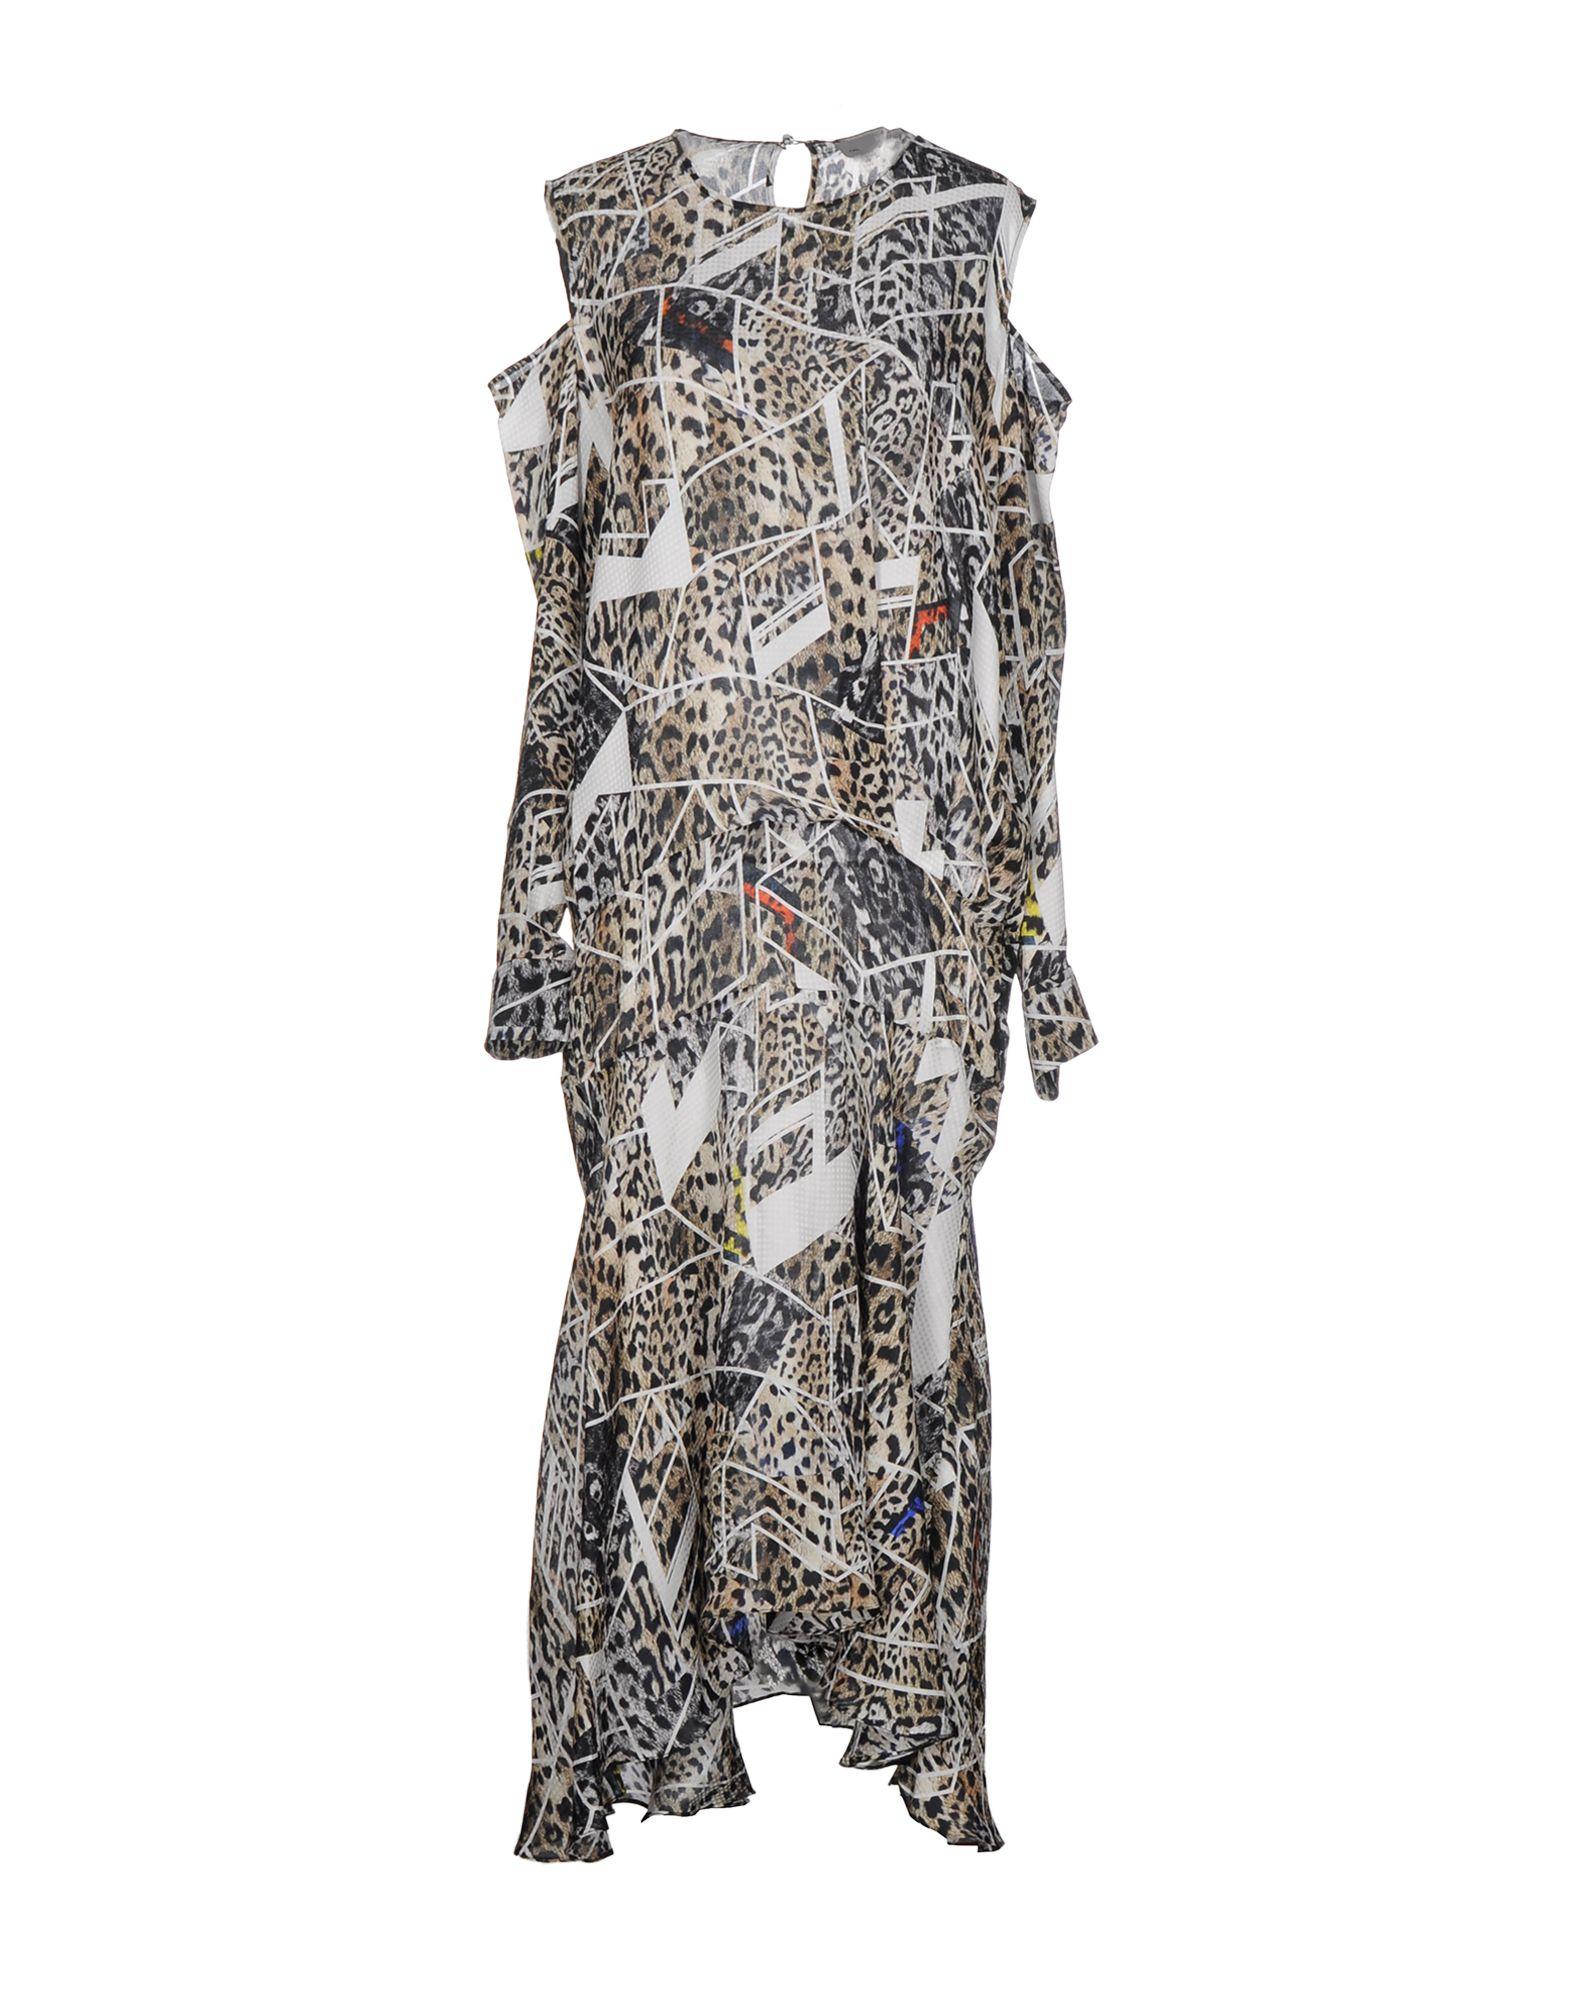 платье preen платье PREEN by THORNTON BREGAZZI Платье длиной 3/4